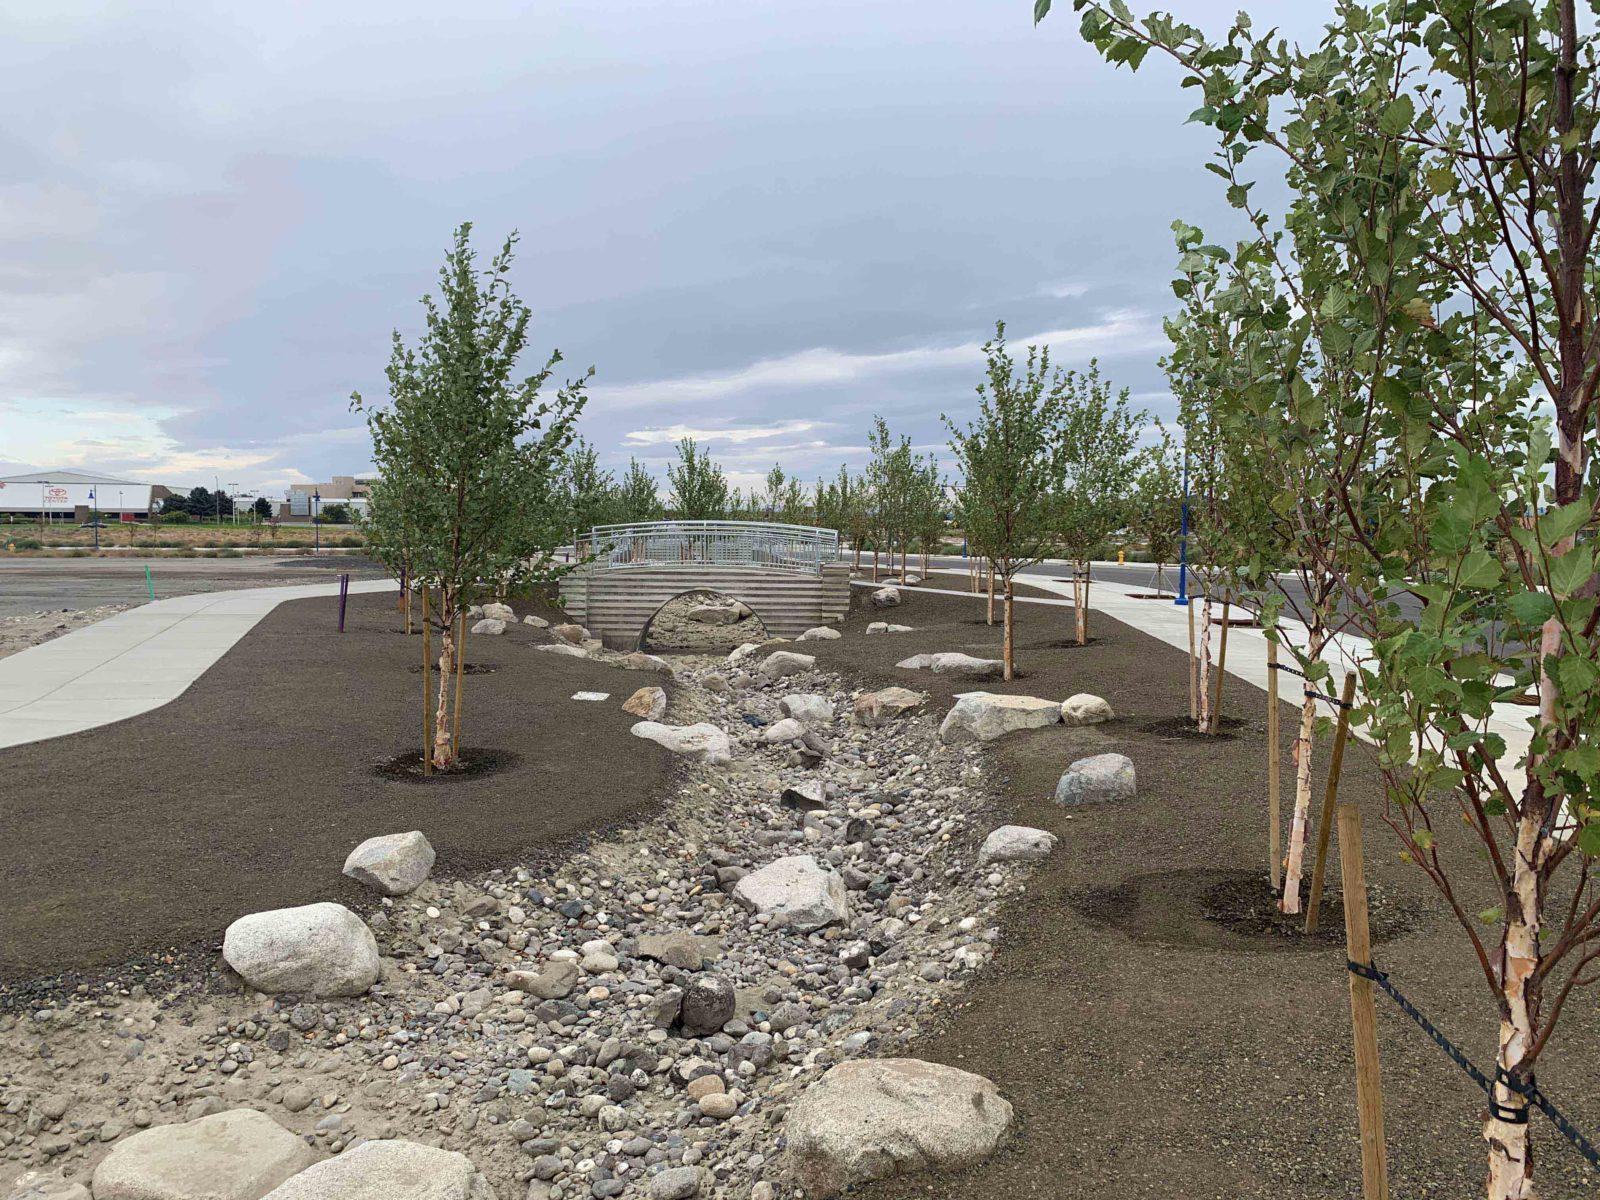 A water feature at Vista Field runs under a foot traffic bridge - phase one redevelopment.